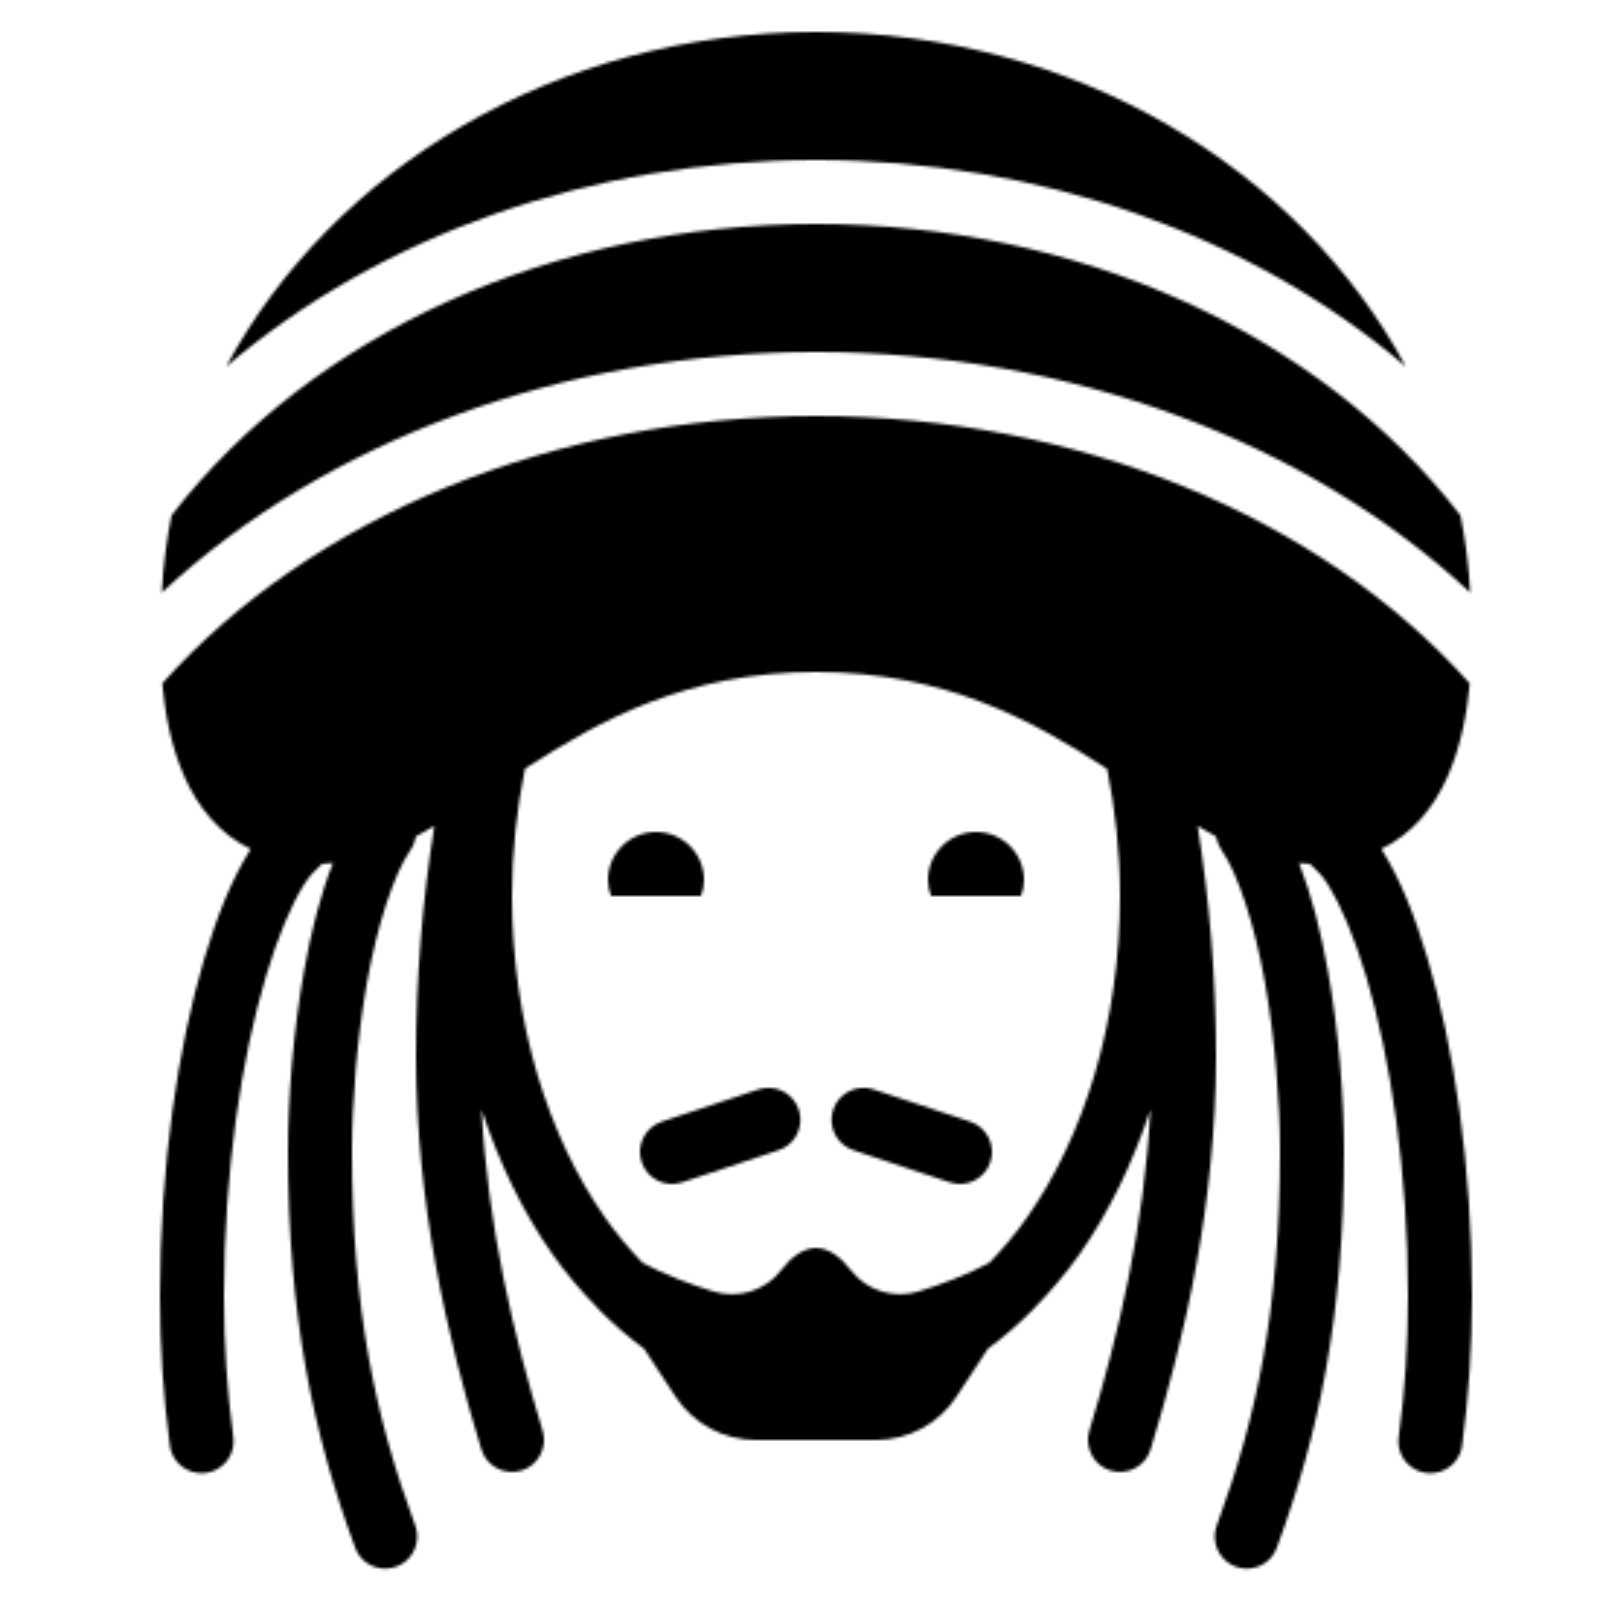 Reggae Filled icon